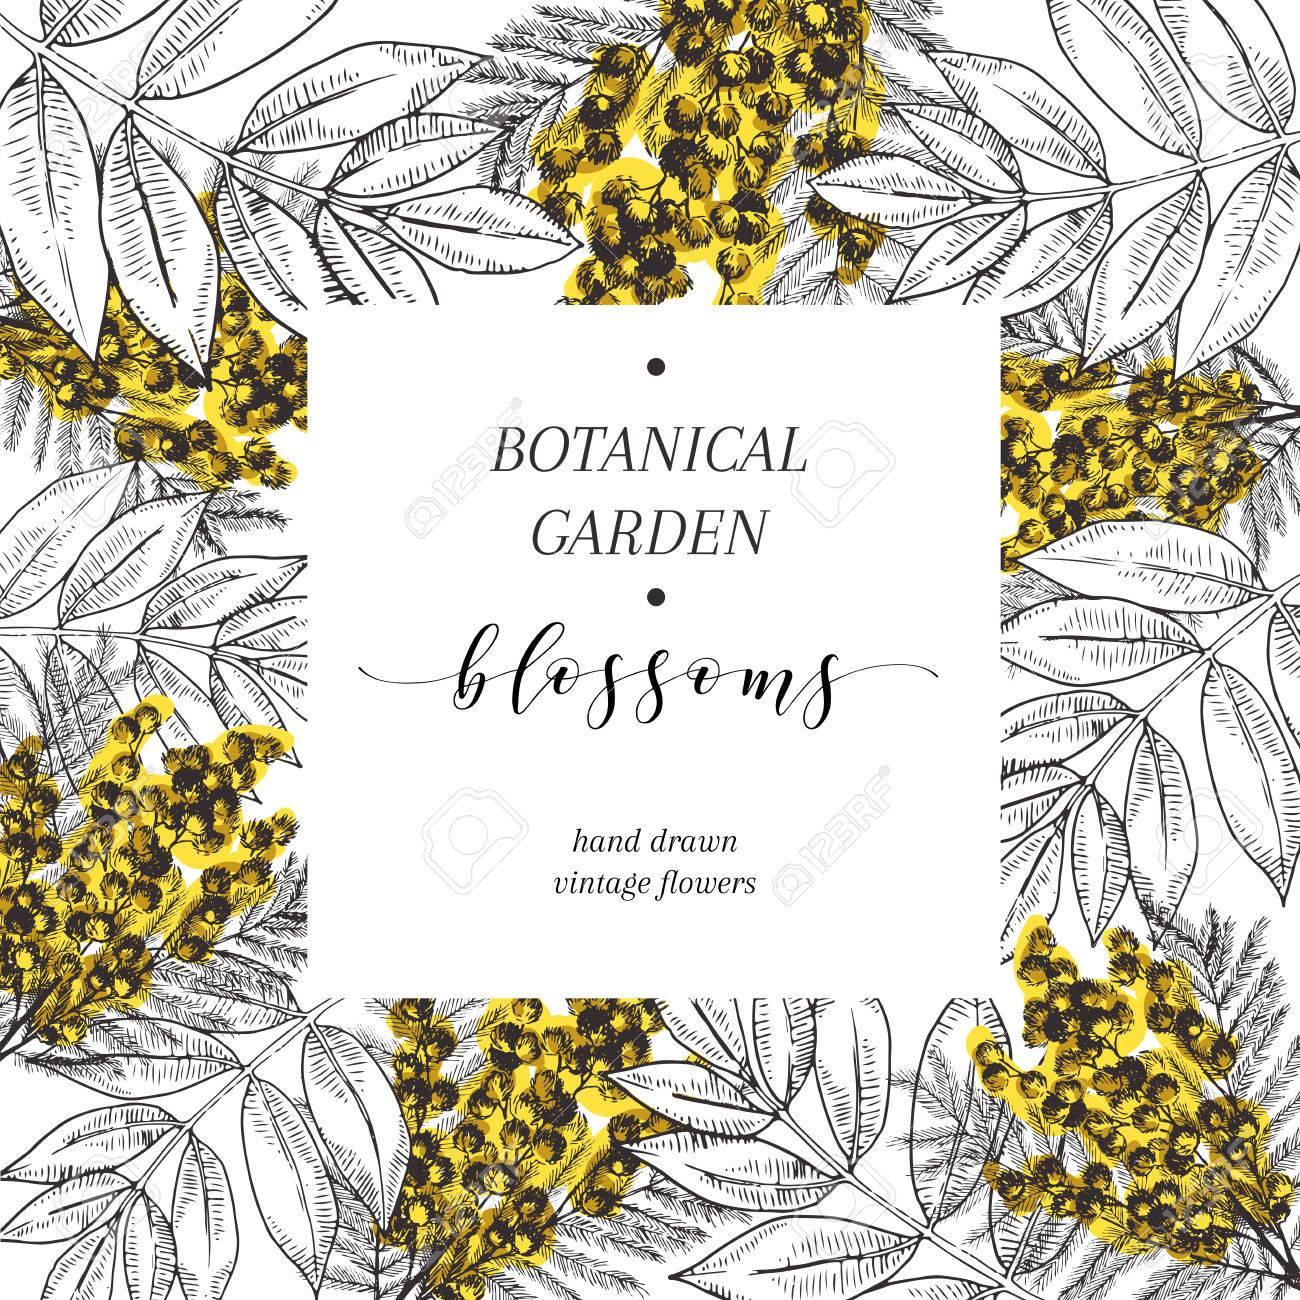 Vector Hand Drawn Blossoms Poster Engraved Botanical Art Vintage